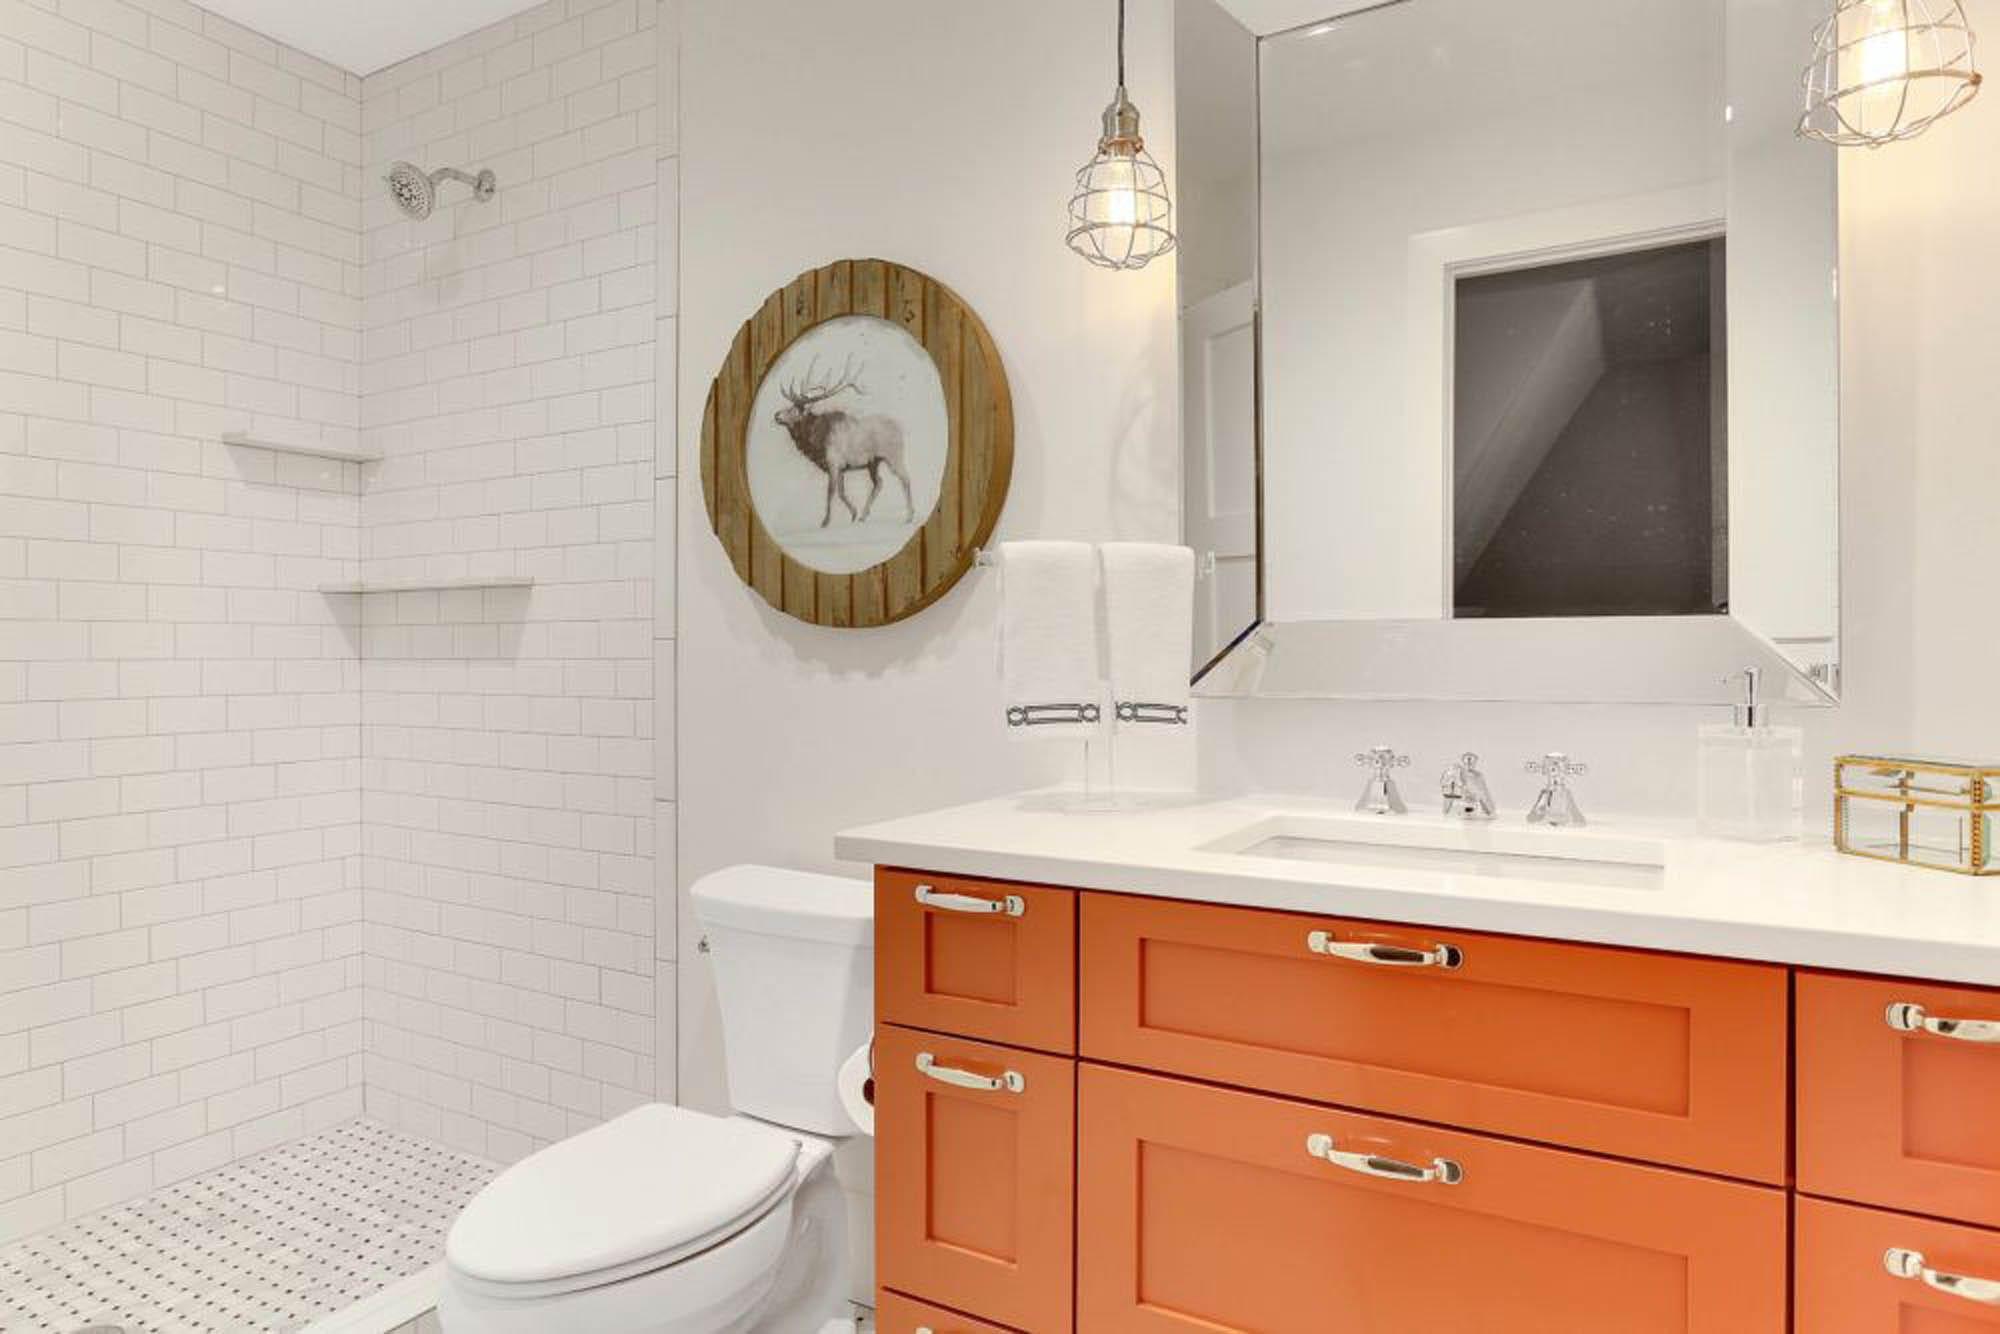 A pop of orange in a white tiled bathroom